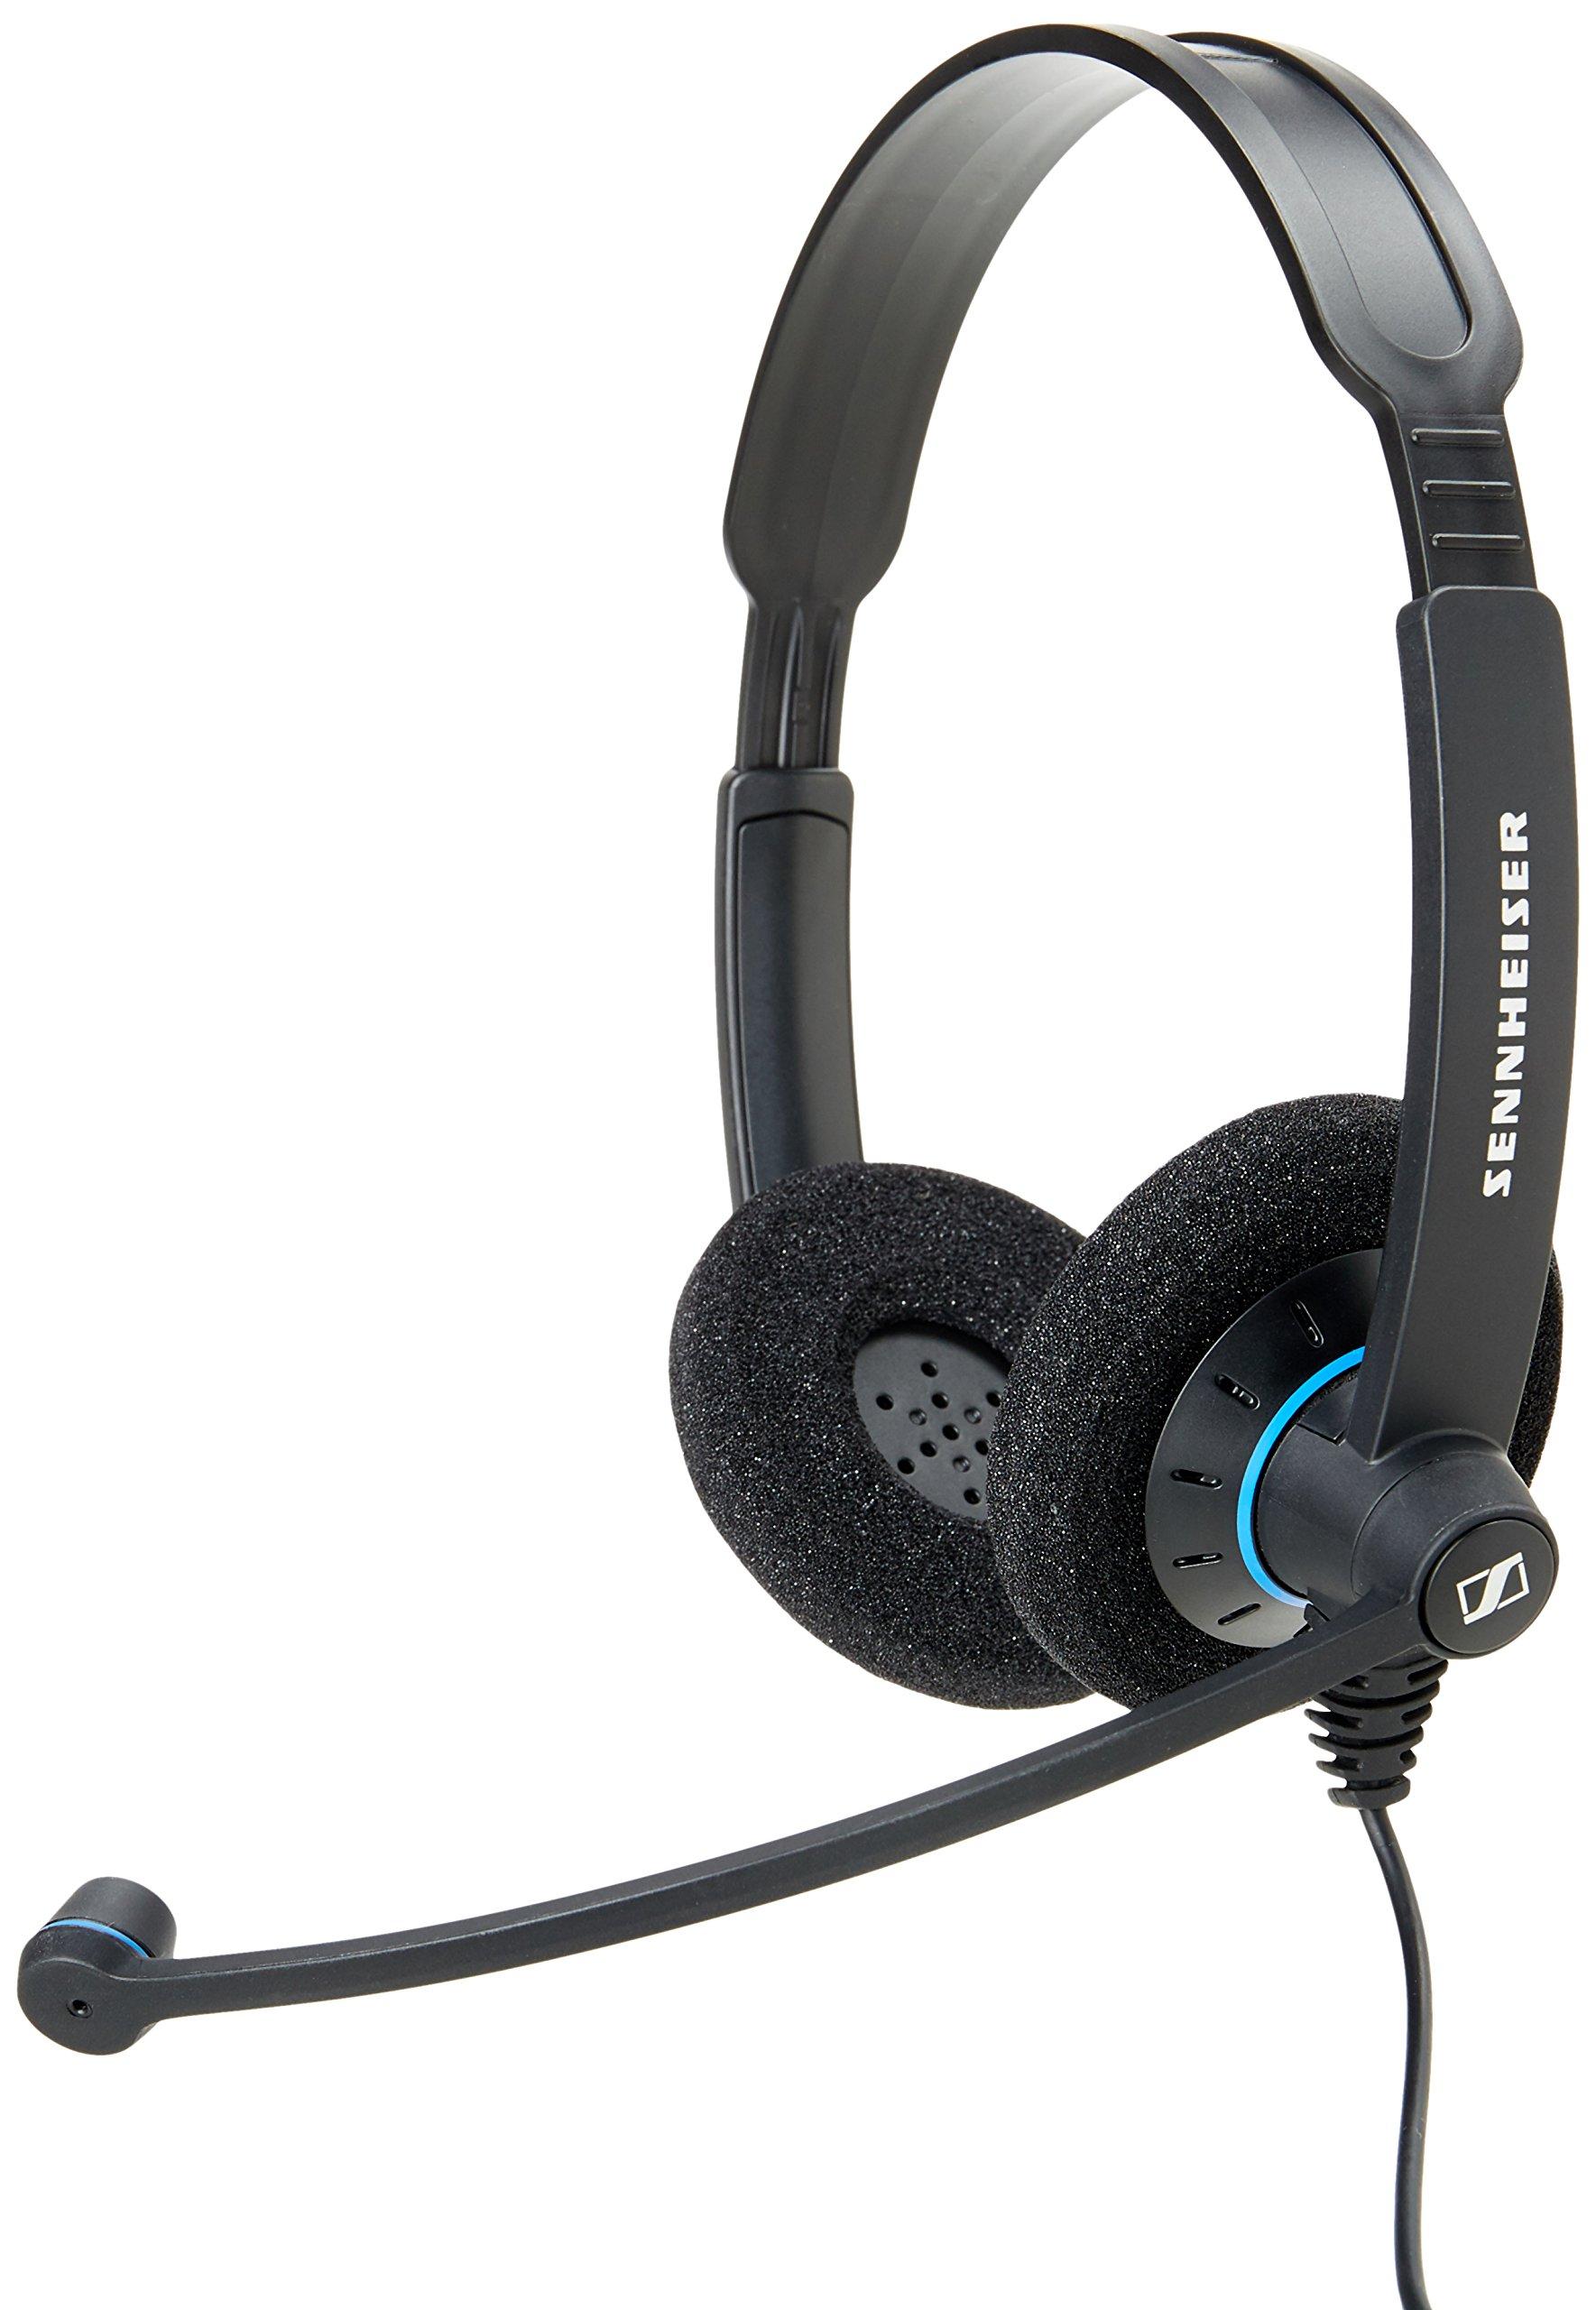 Sennheiser Culture Series Wideband Headset (SC60-USB-CTRL)